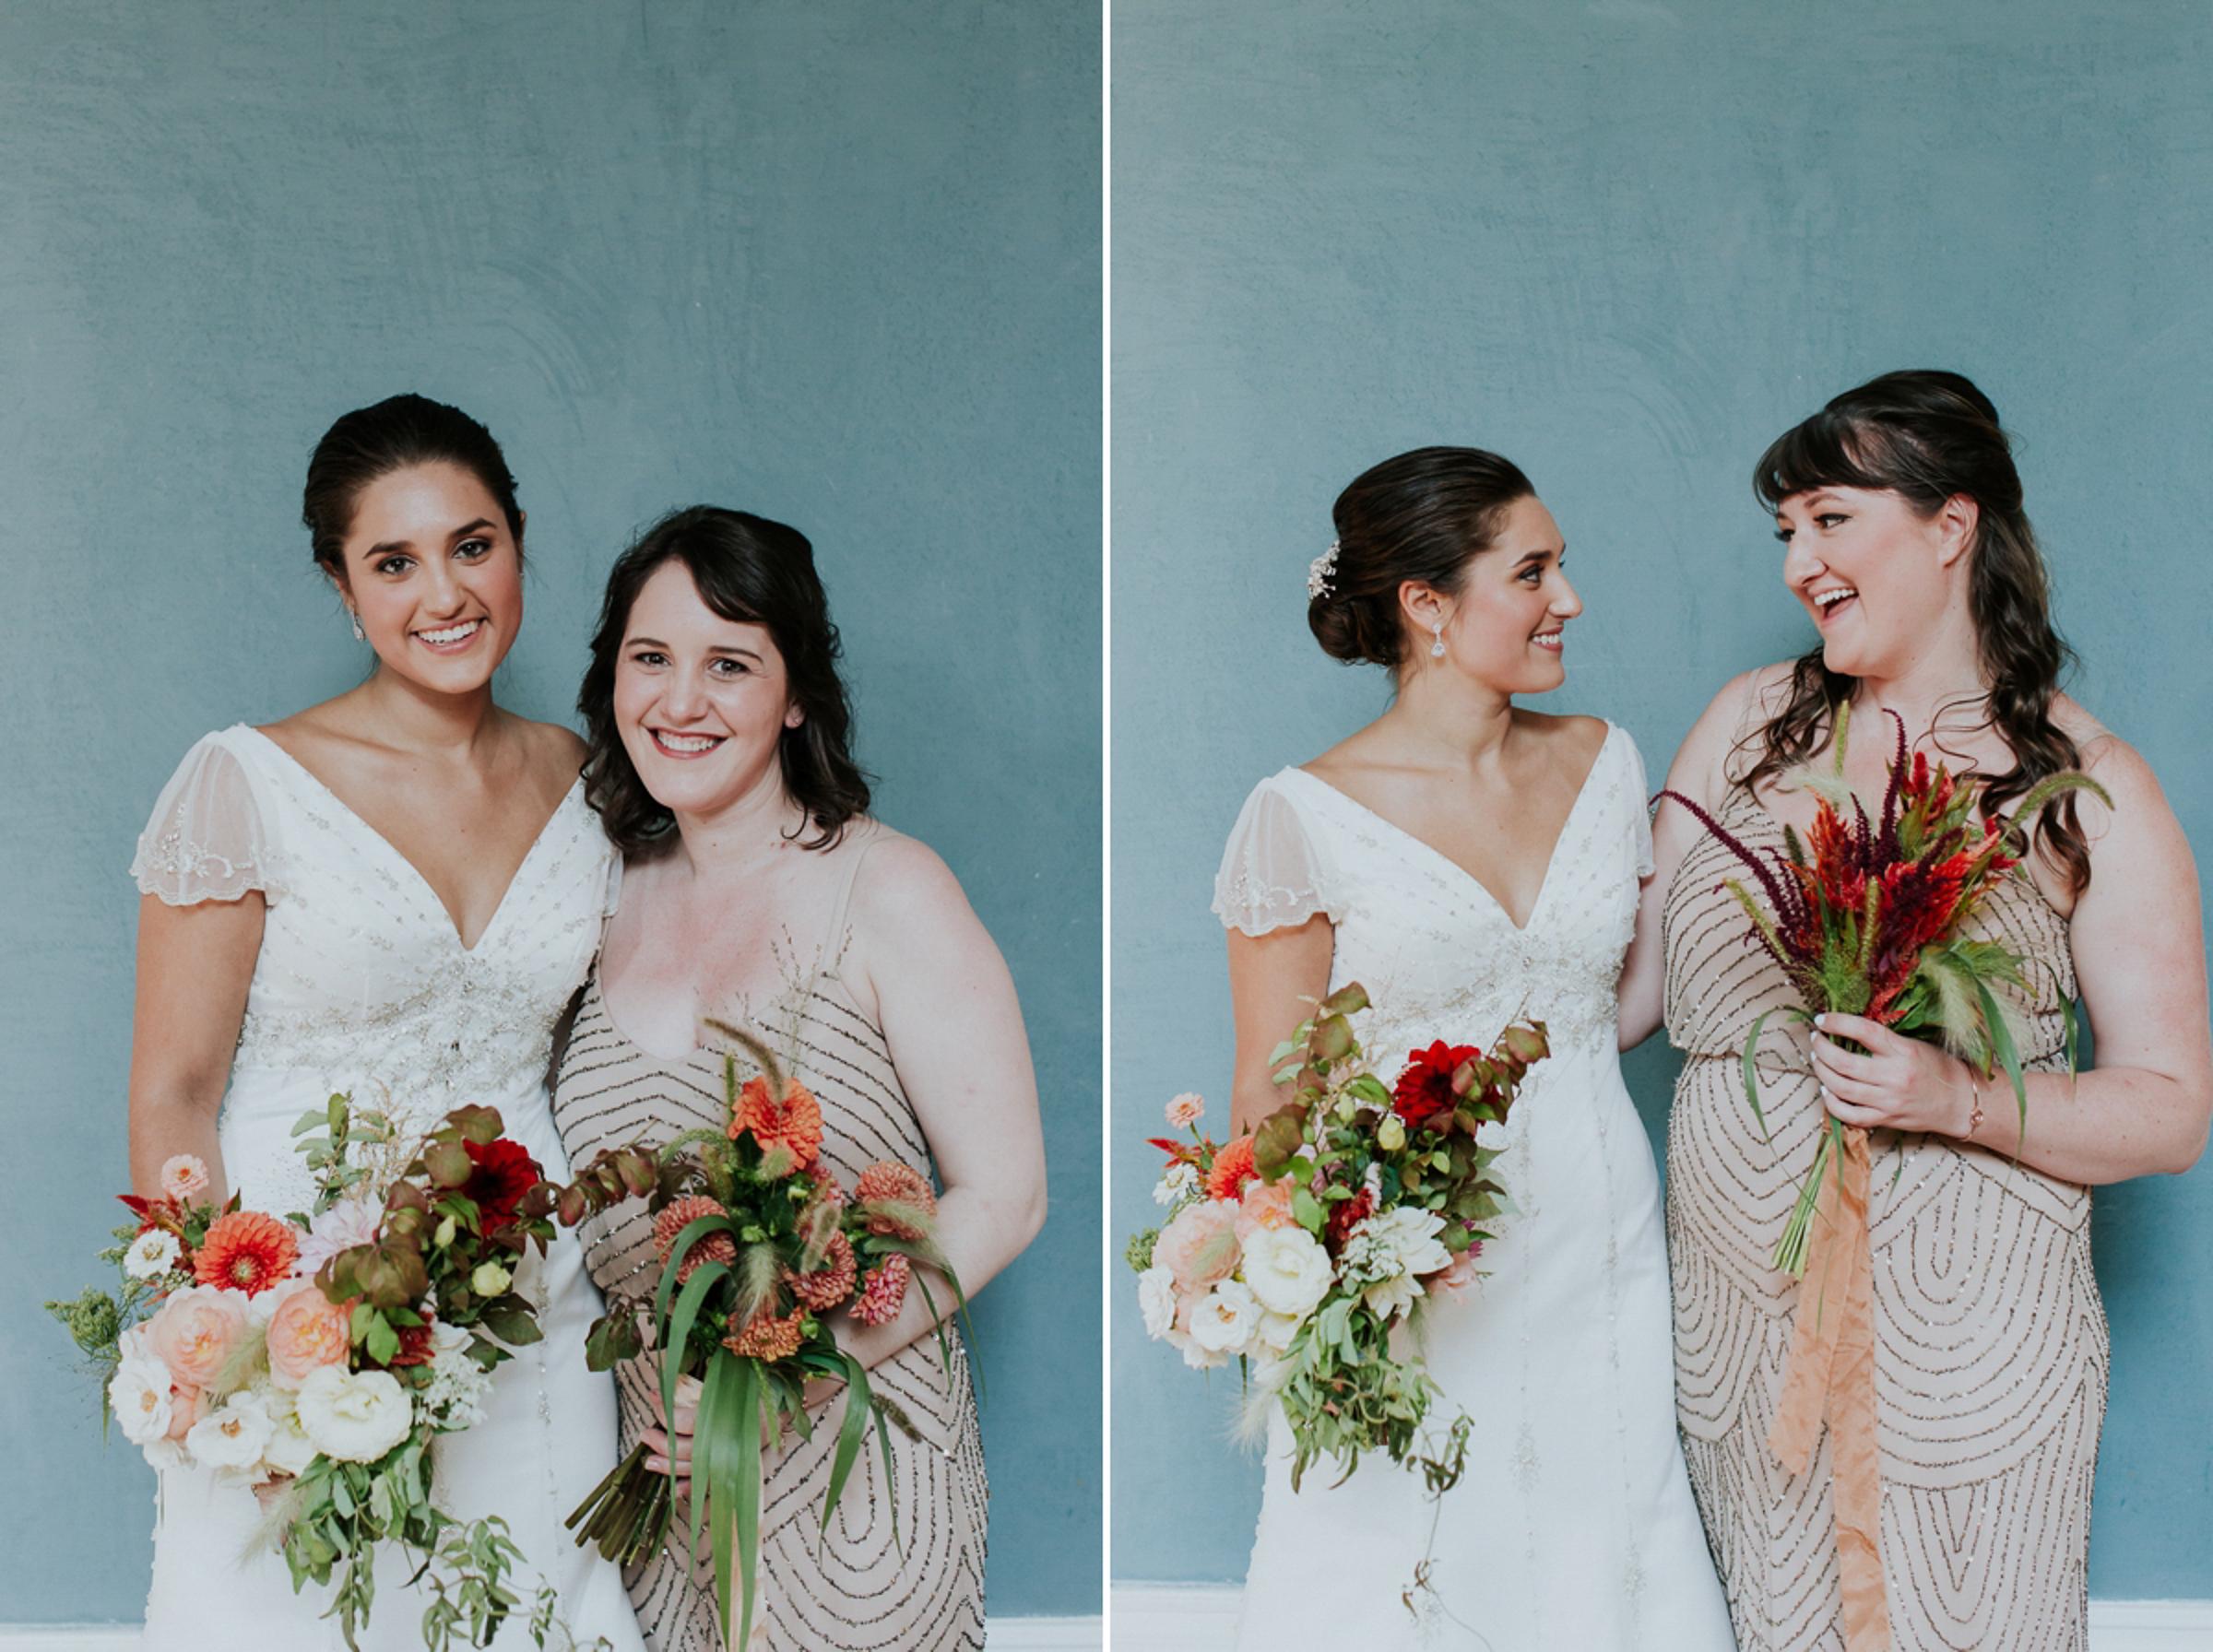 Brooklyn-Winery-NYC-Editorial-Documentary-Wedding-Photographer-Gina-Oli-120.jpg